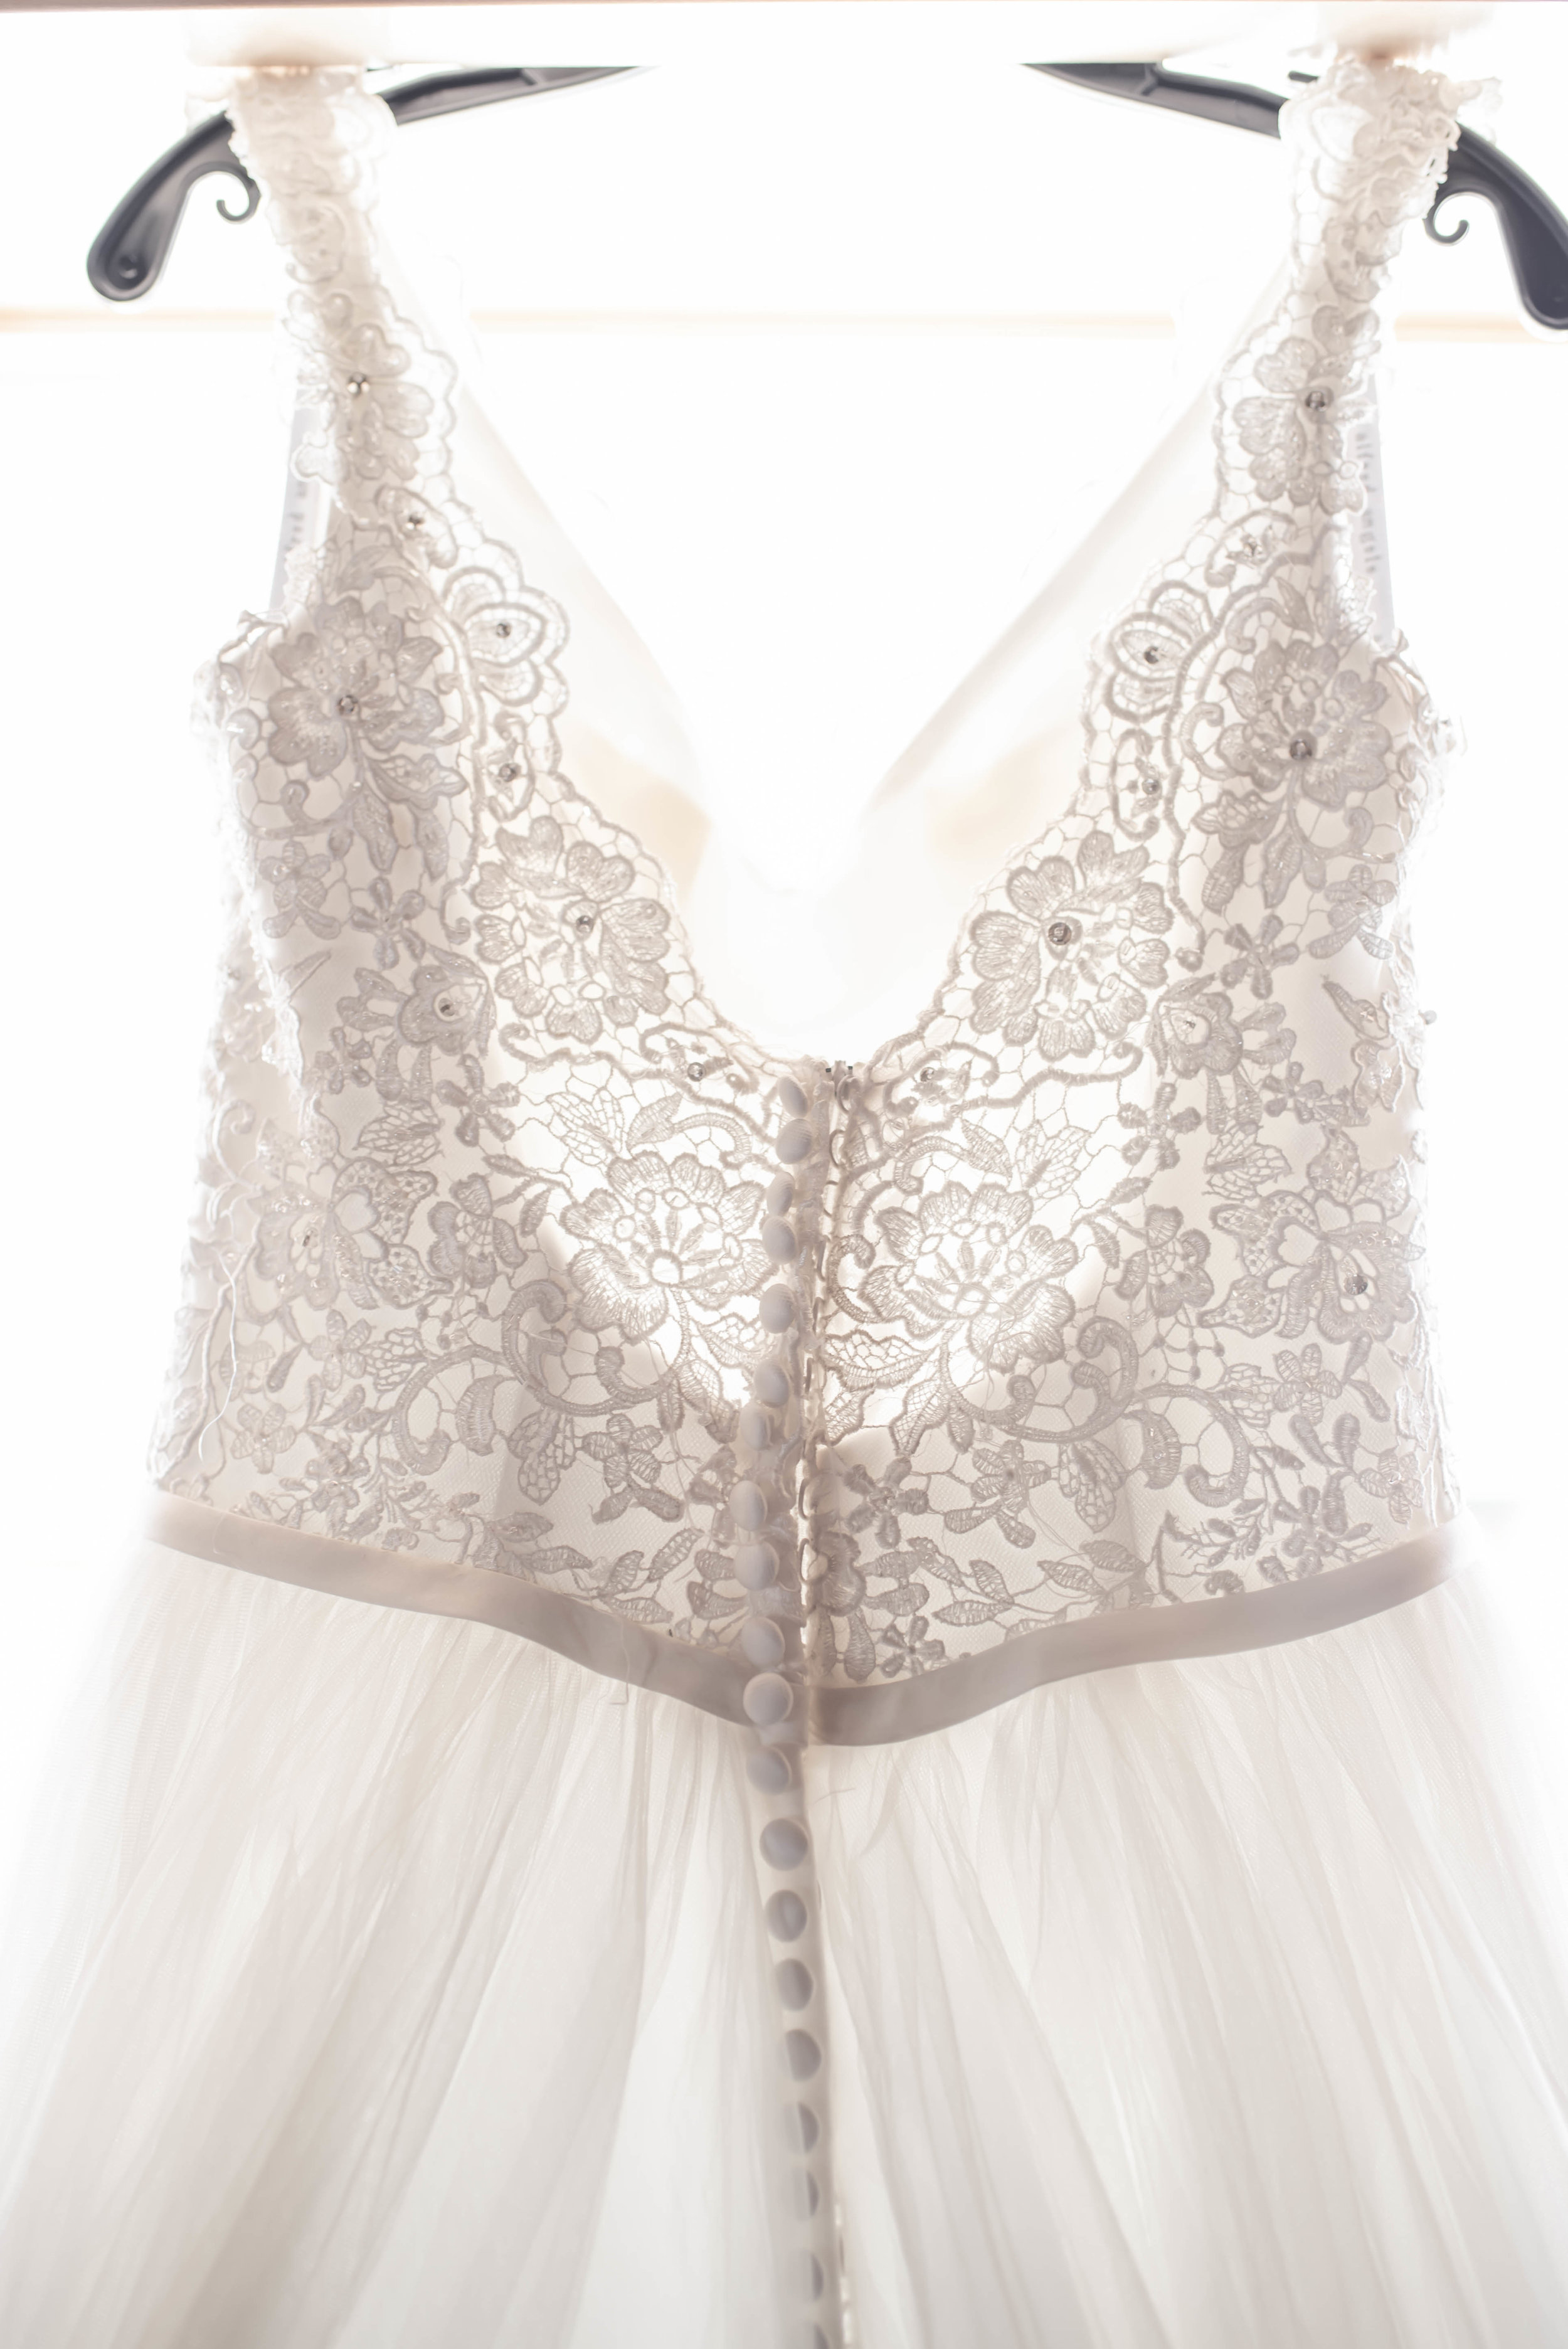 mountain wedding dresses new mexico bridal gown.jpg